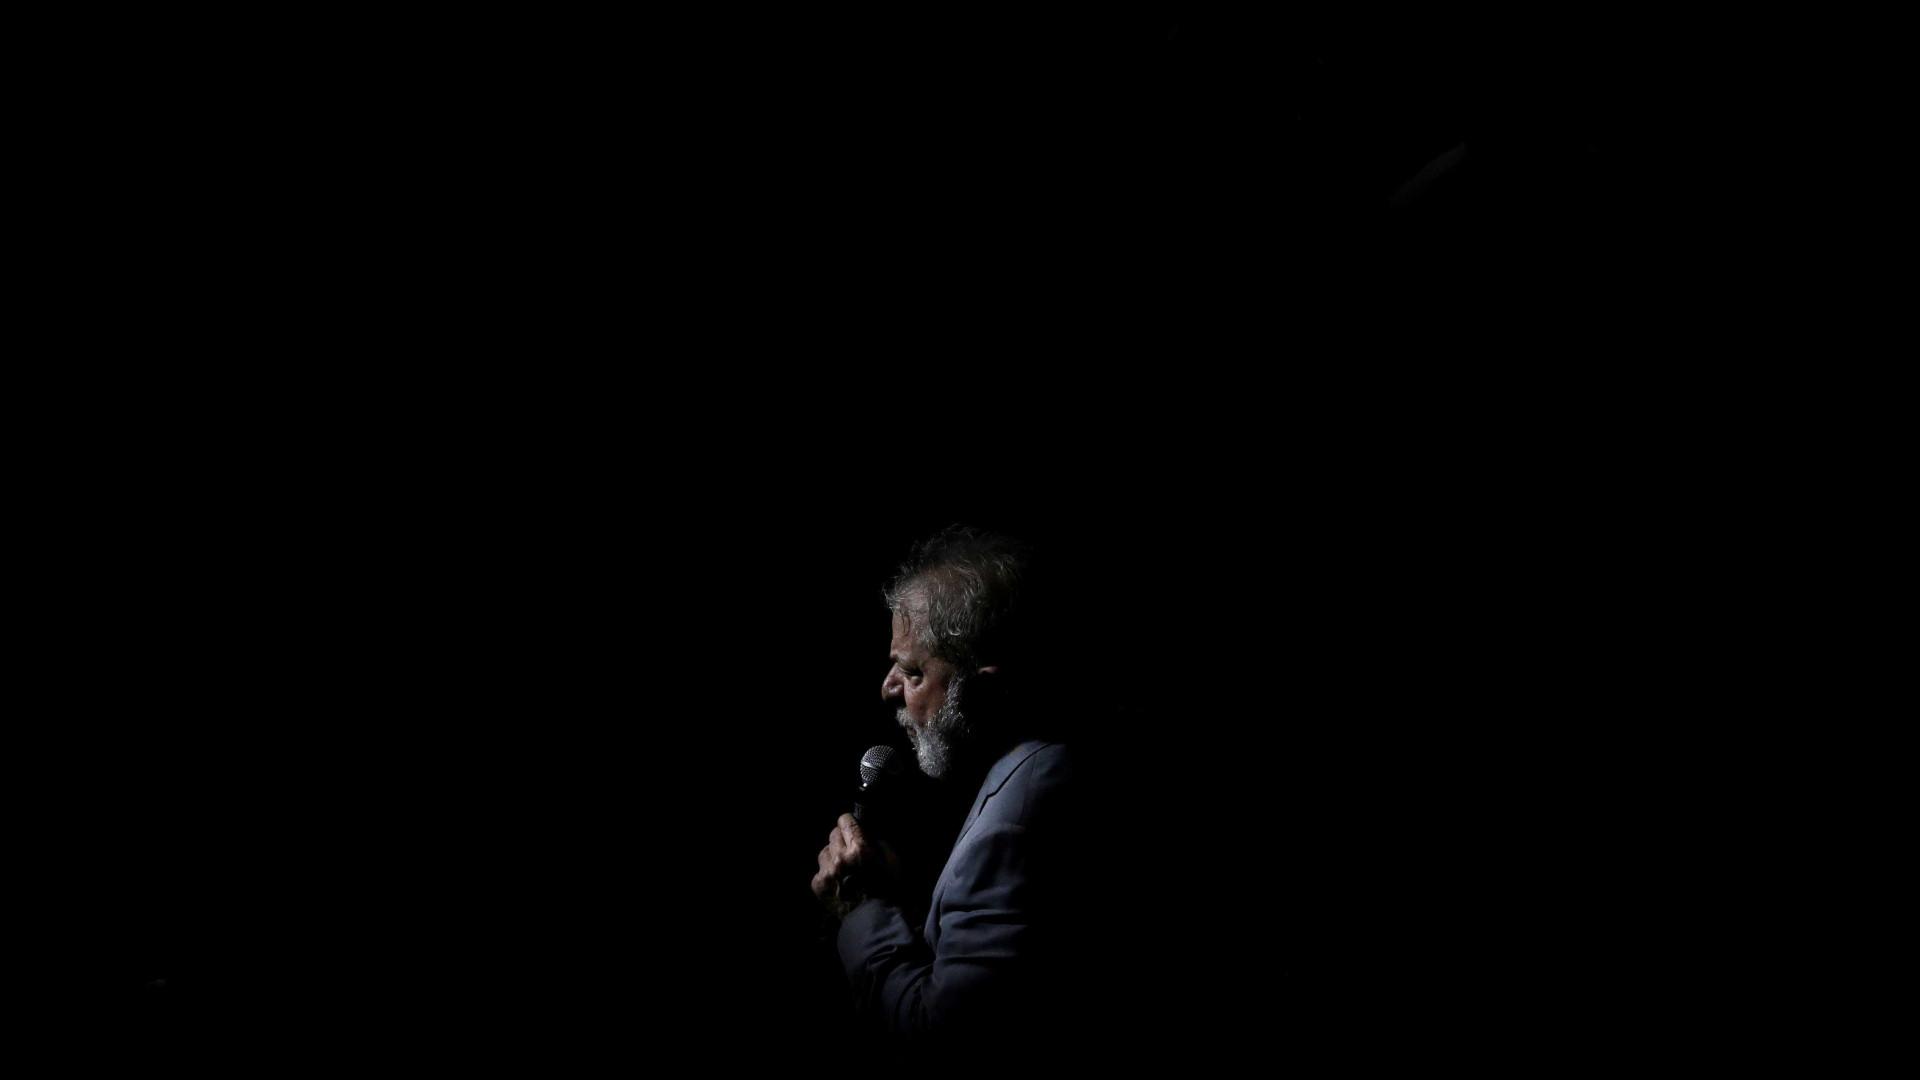 Fachin nega recurso de Lula e julgamento é cancelado no Supremo